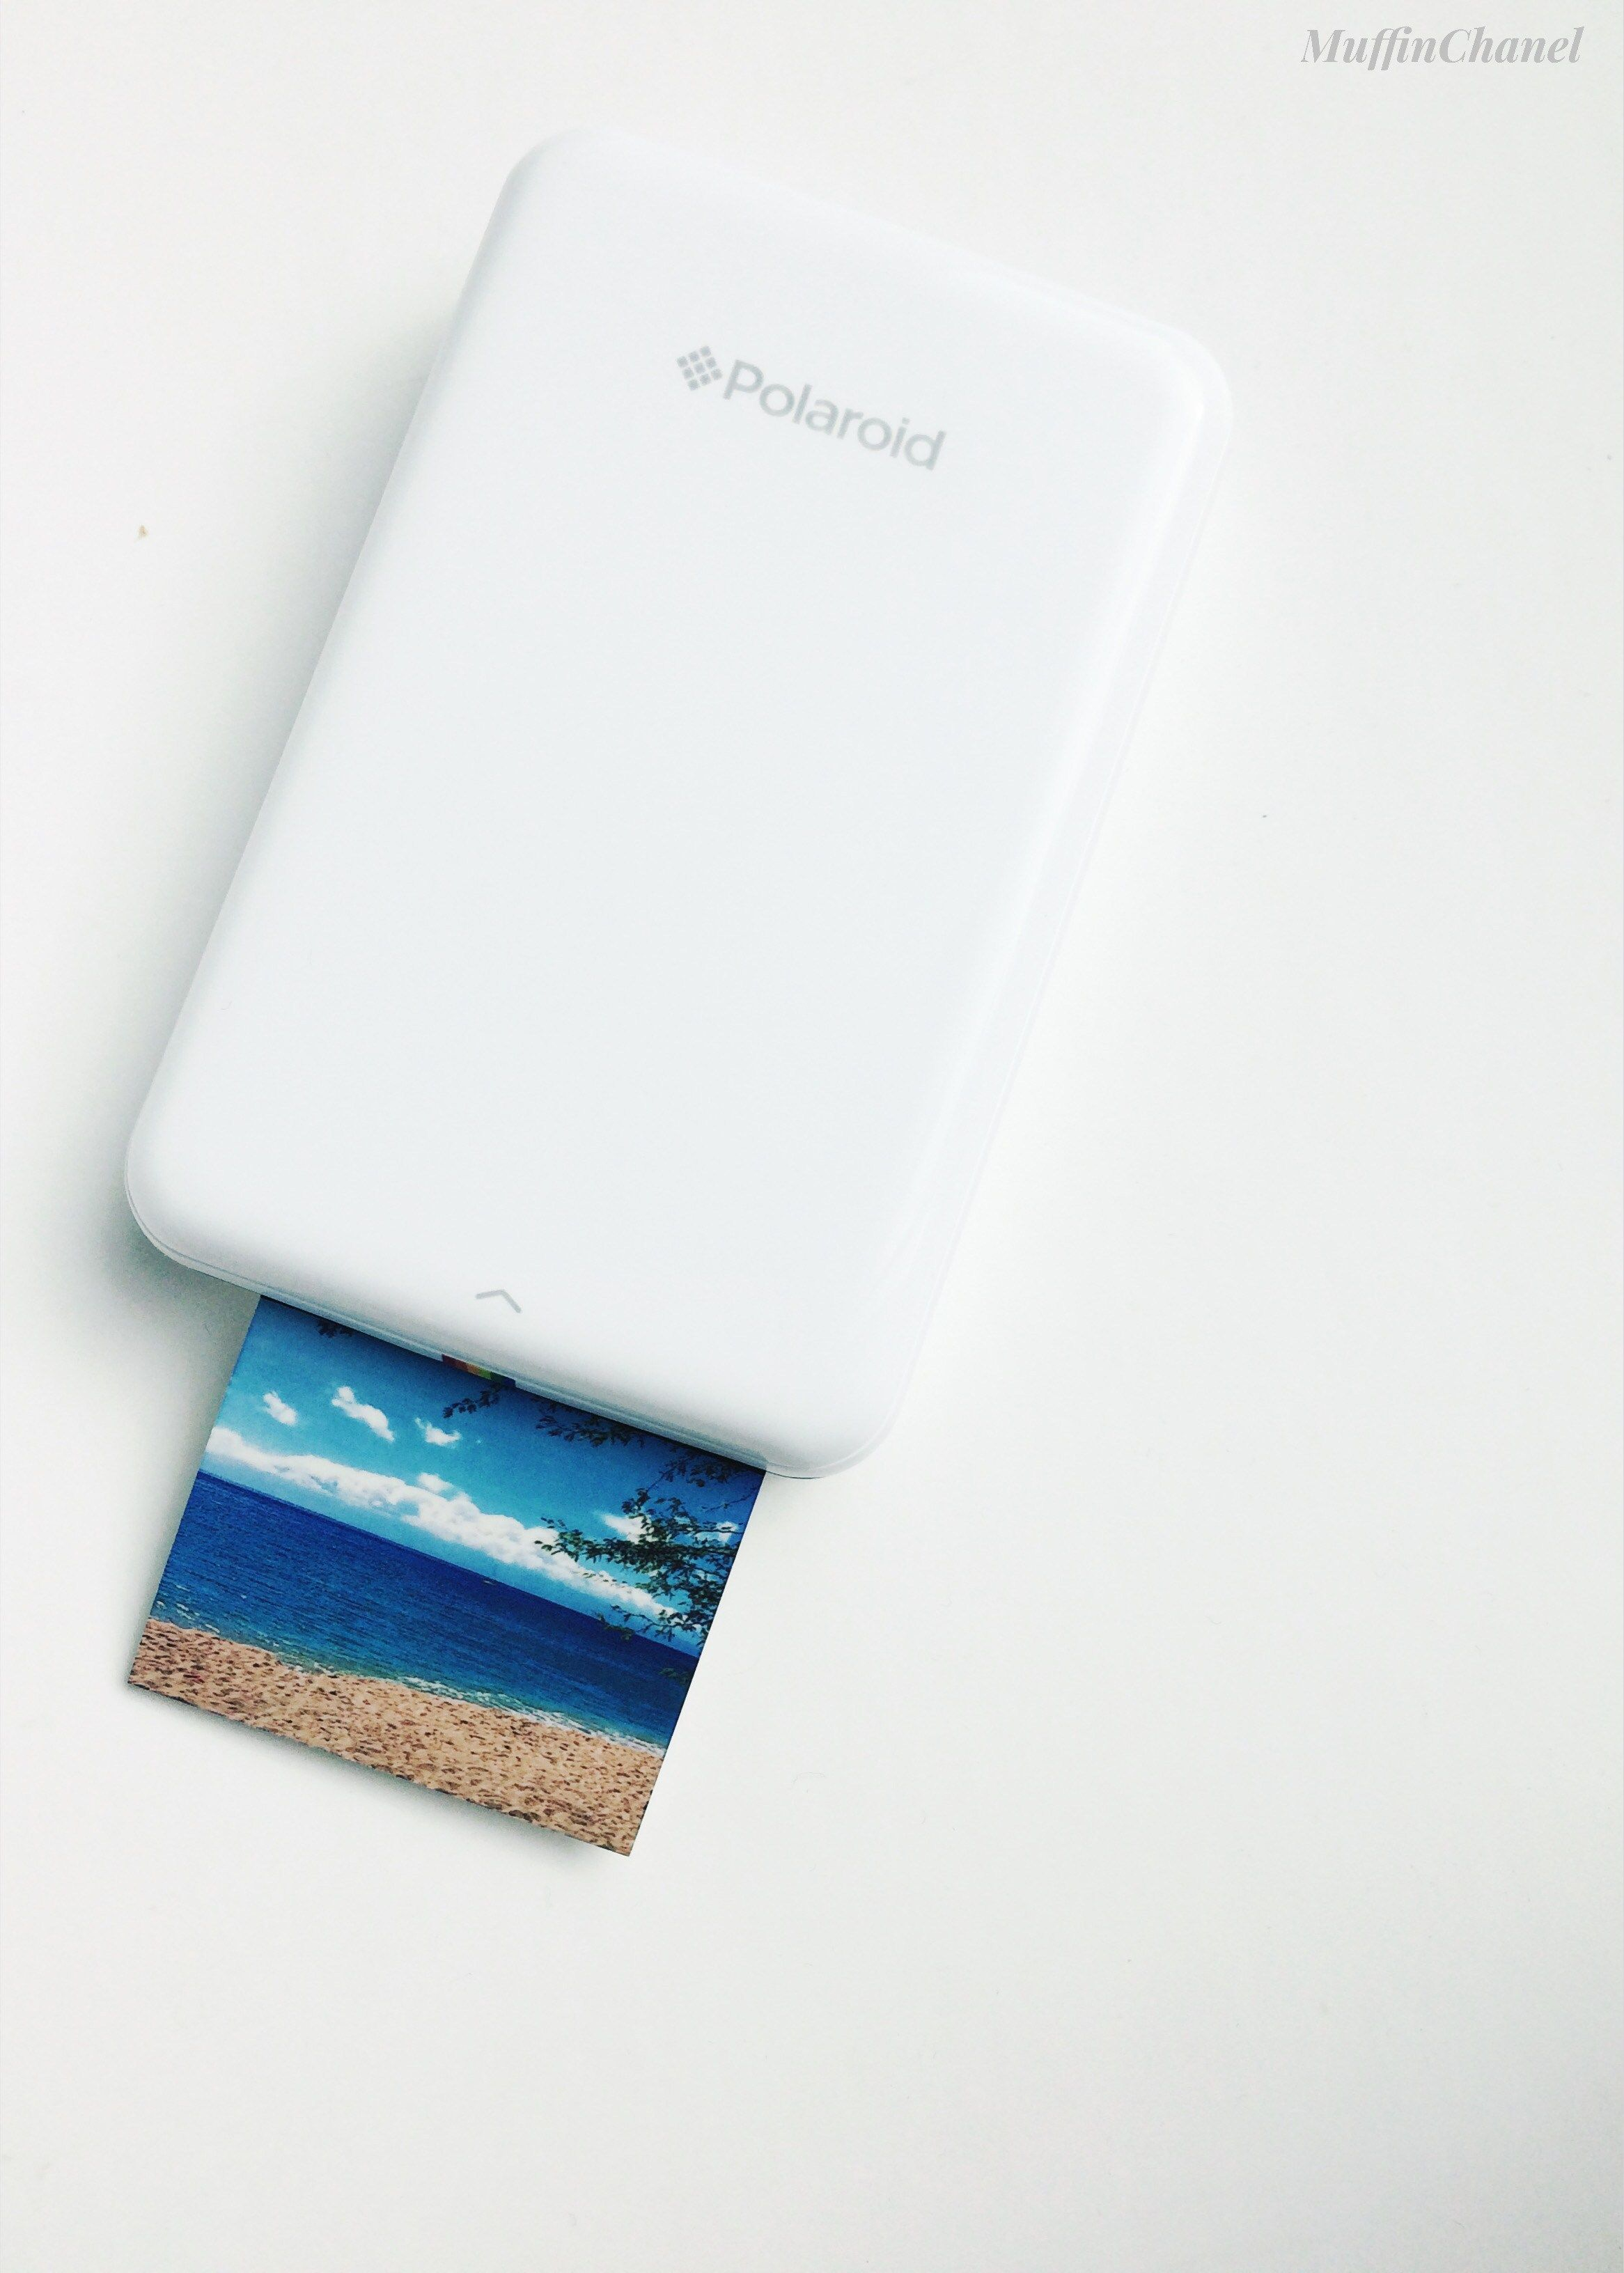 Polaroid Zip Instant Photo Printer Review Muffin Chanel Print 2